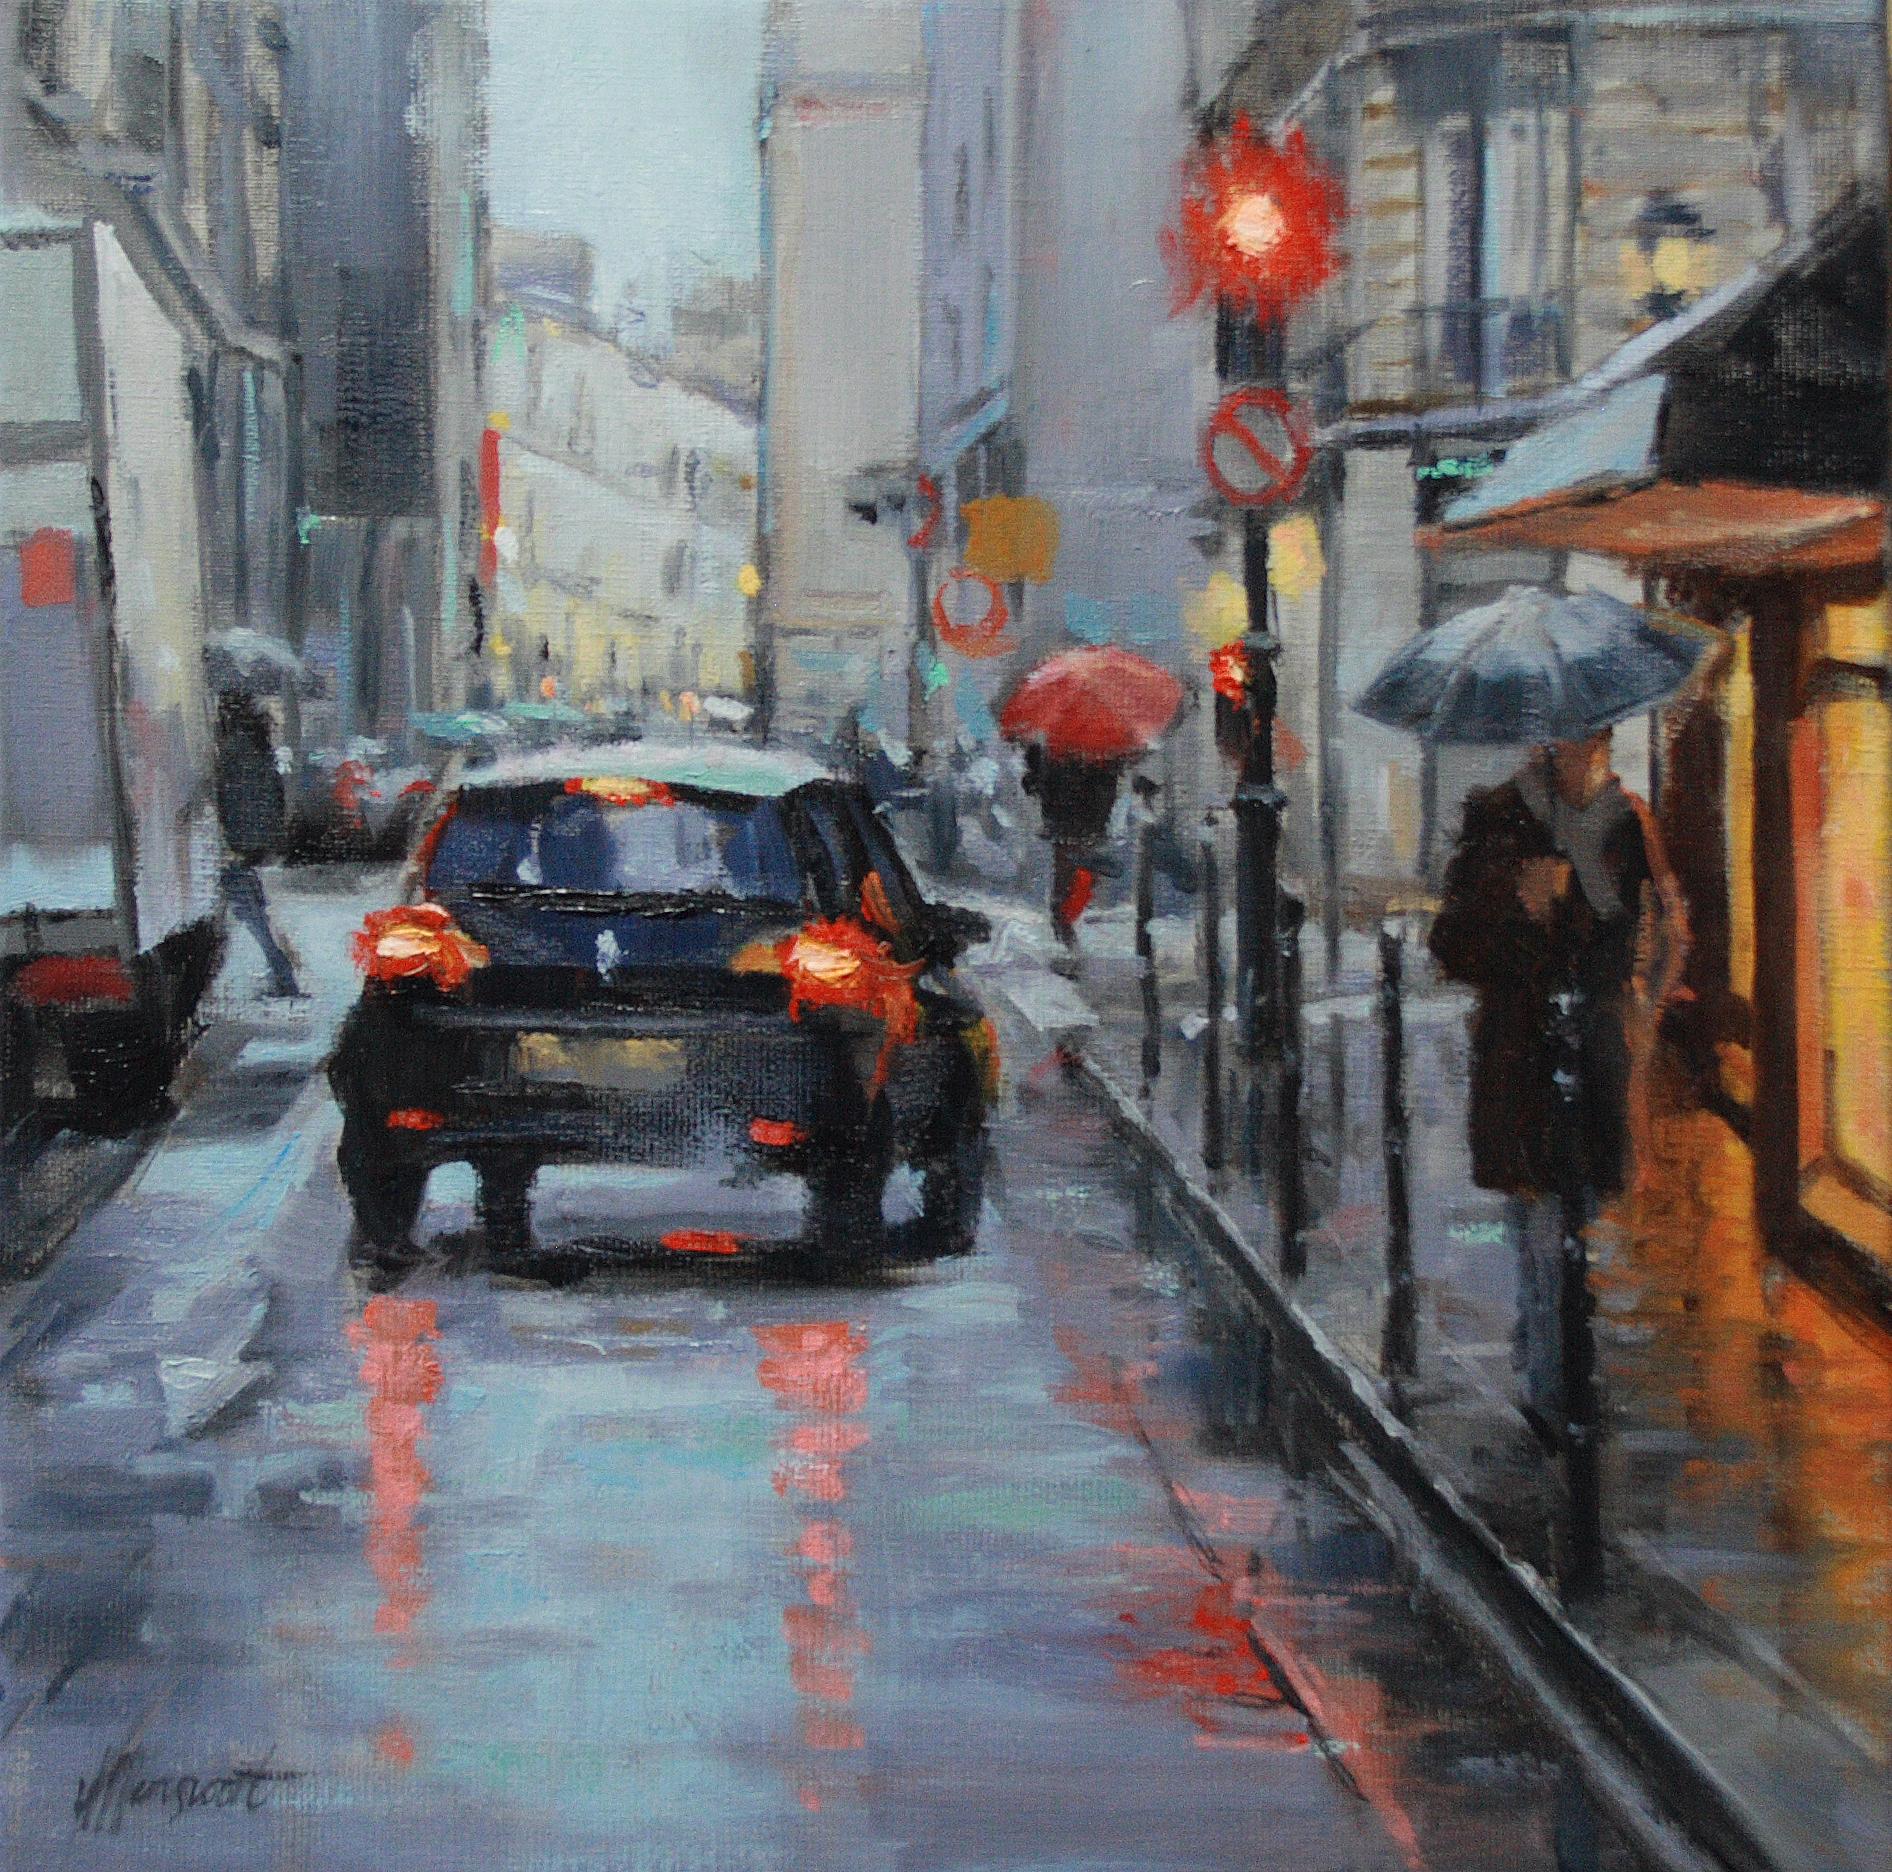 stadsgezicht straat schilderij cityscene